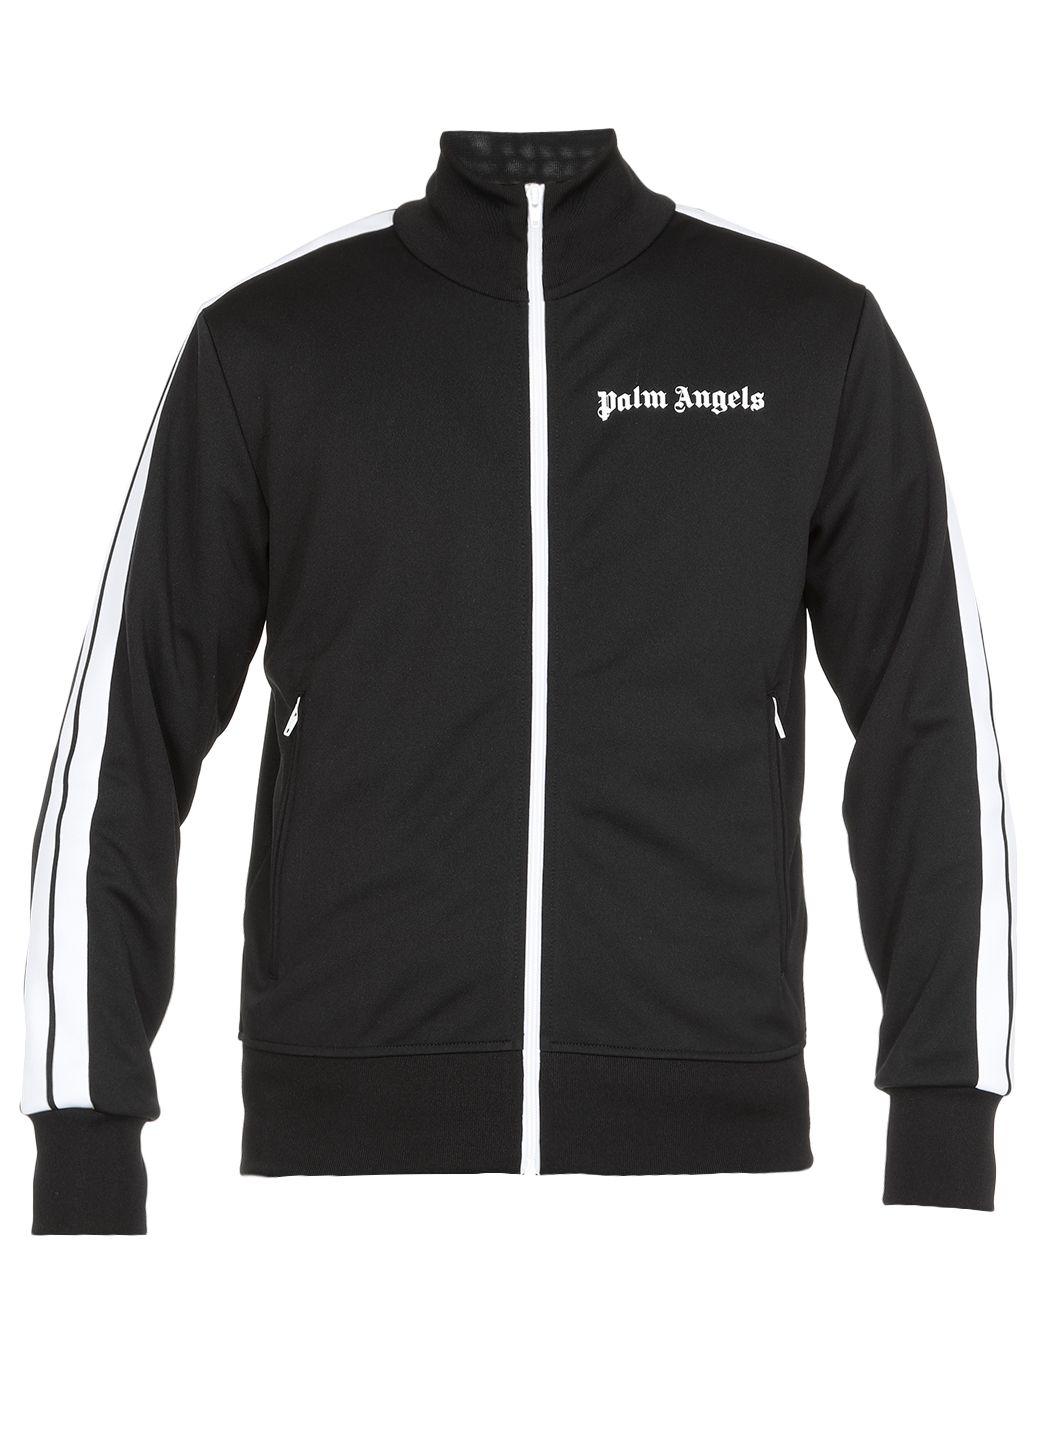 Tech fabric sweatshirt